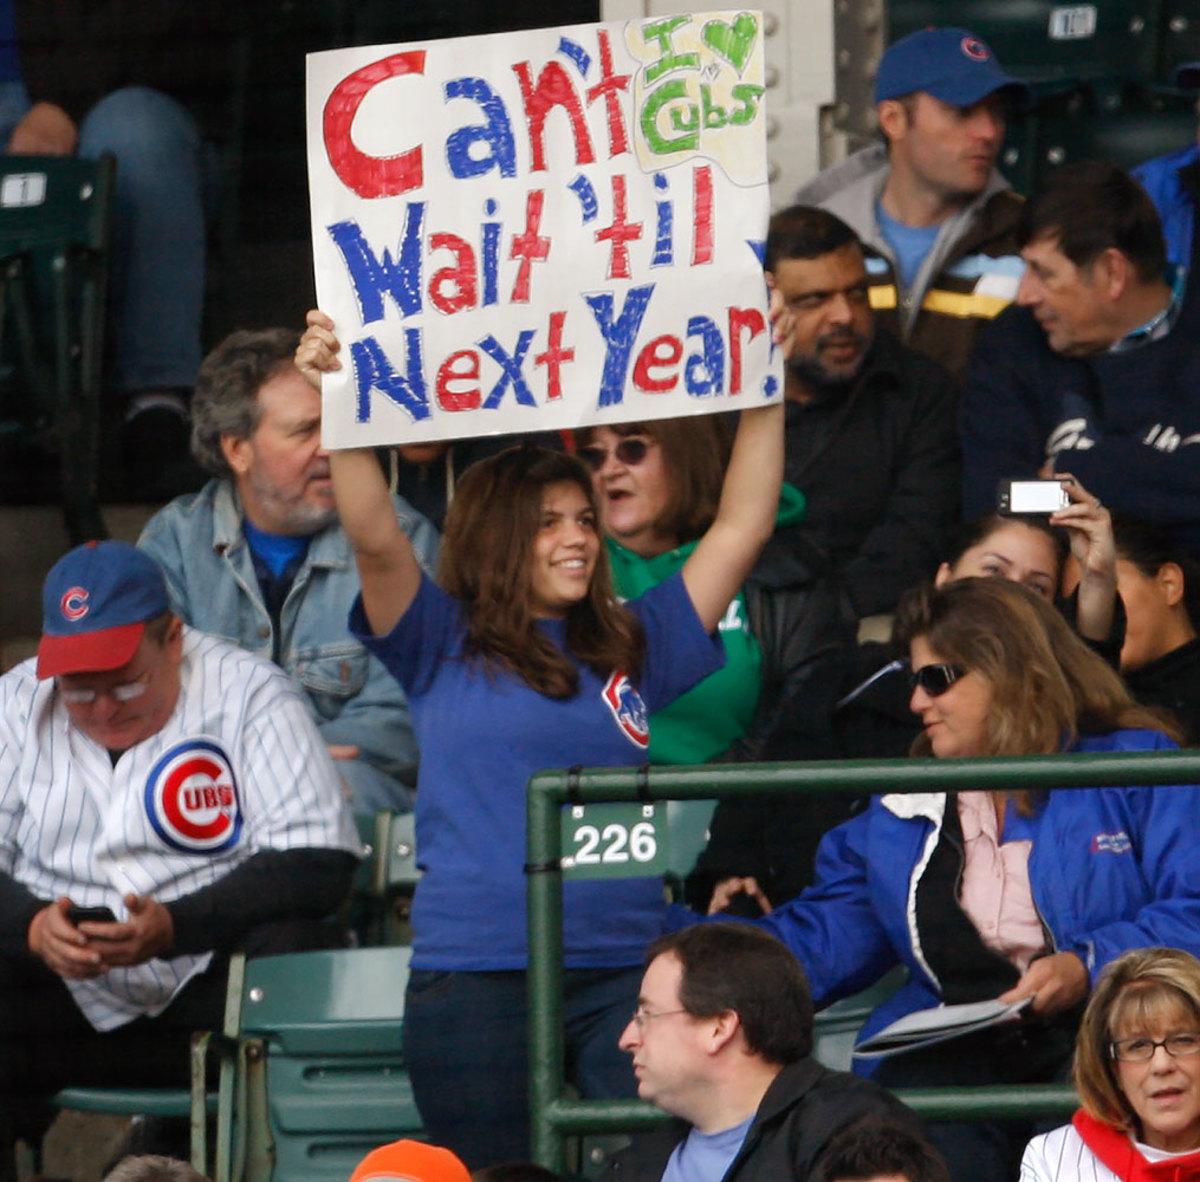 2009-Chicago-Cubs-fan-sign-AP_091003021846.jpg